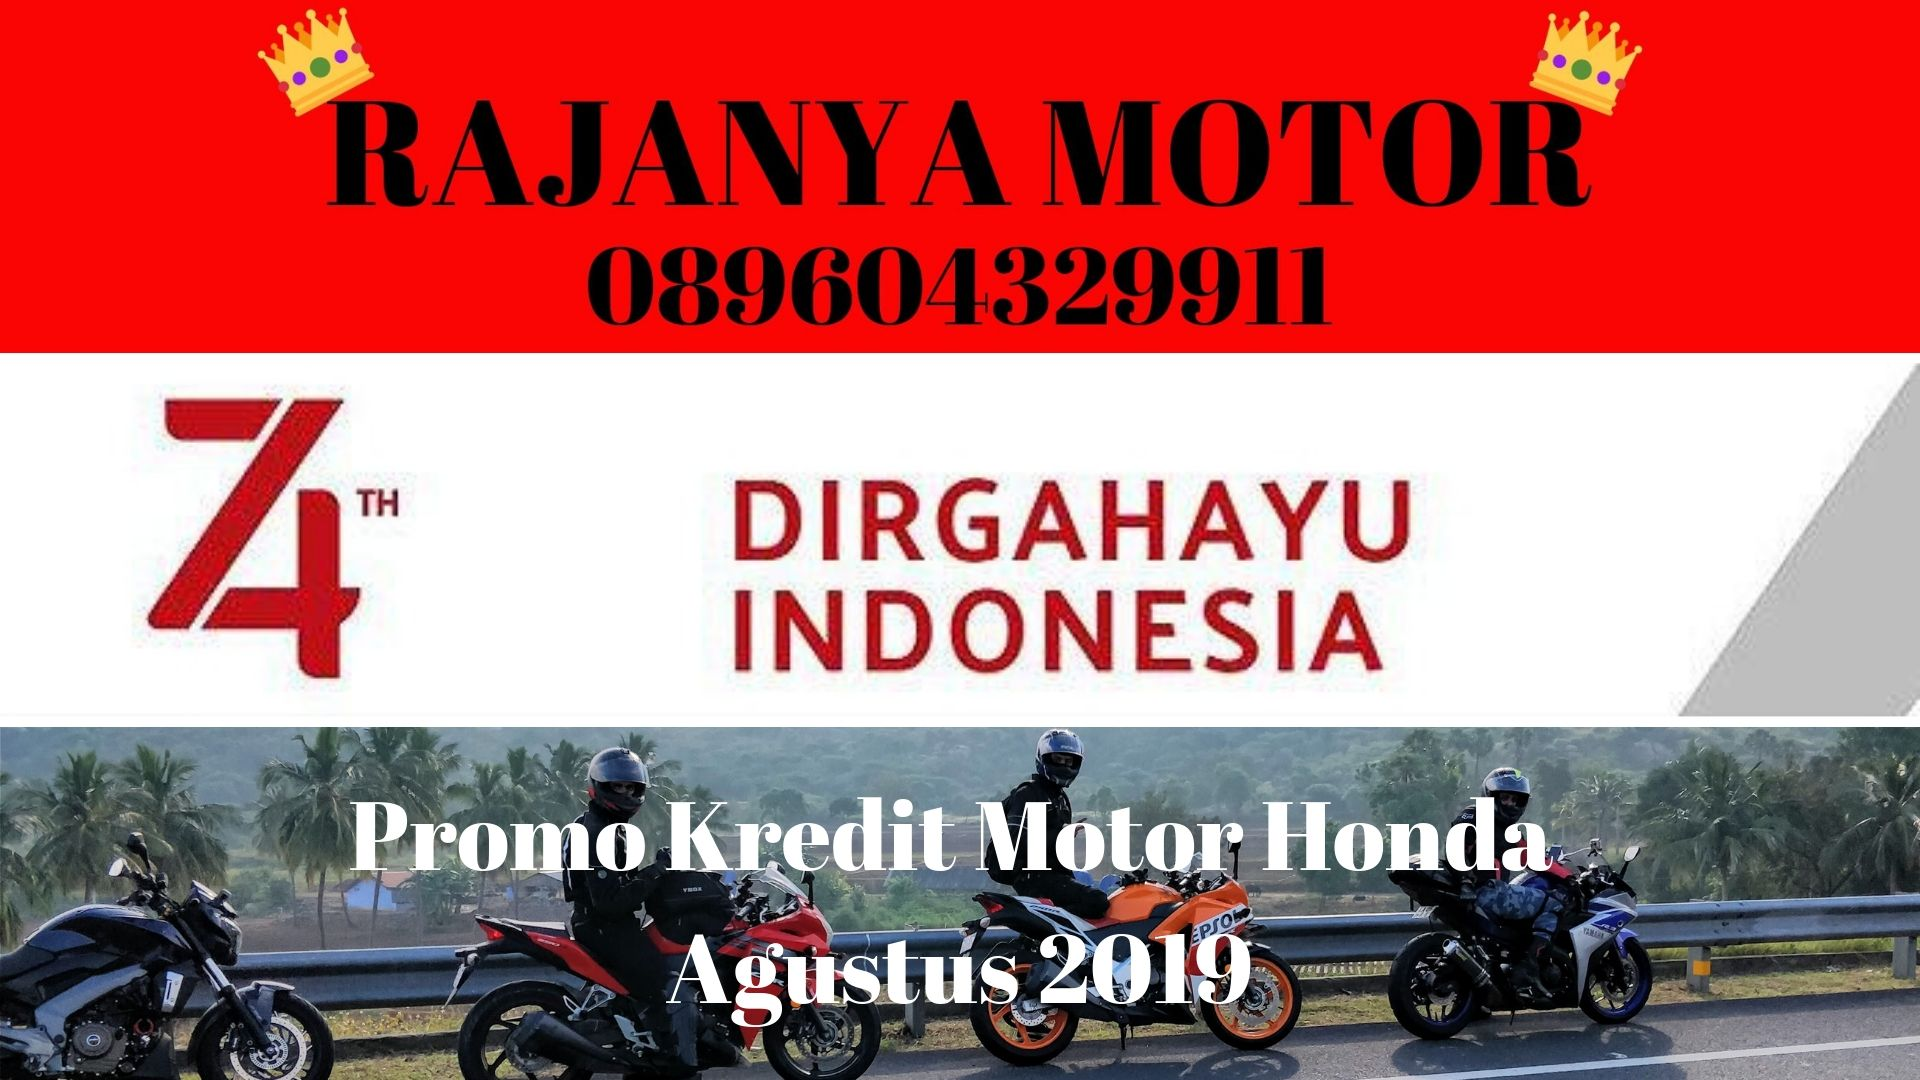 Promo Kredit Motor Honda Agustus 2019